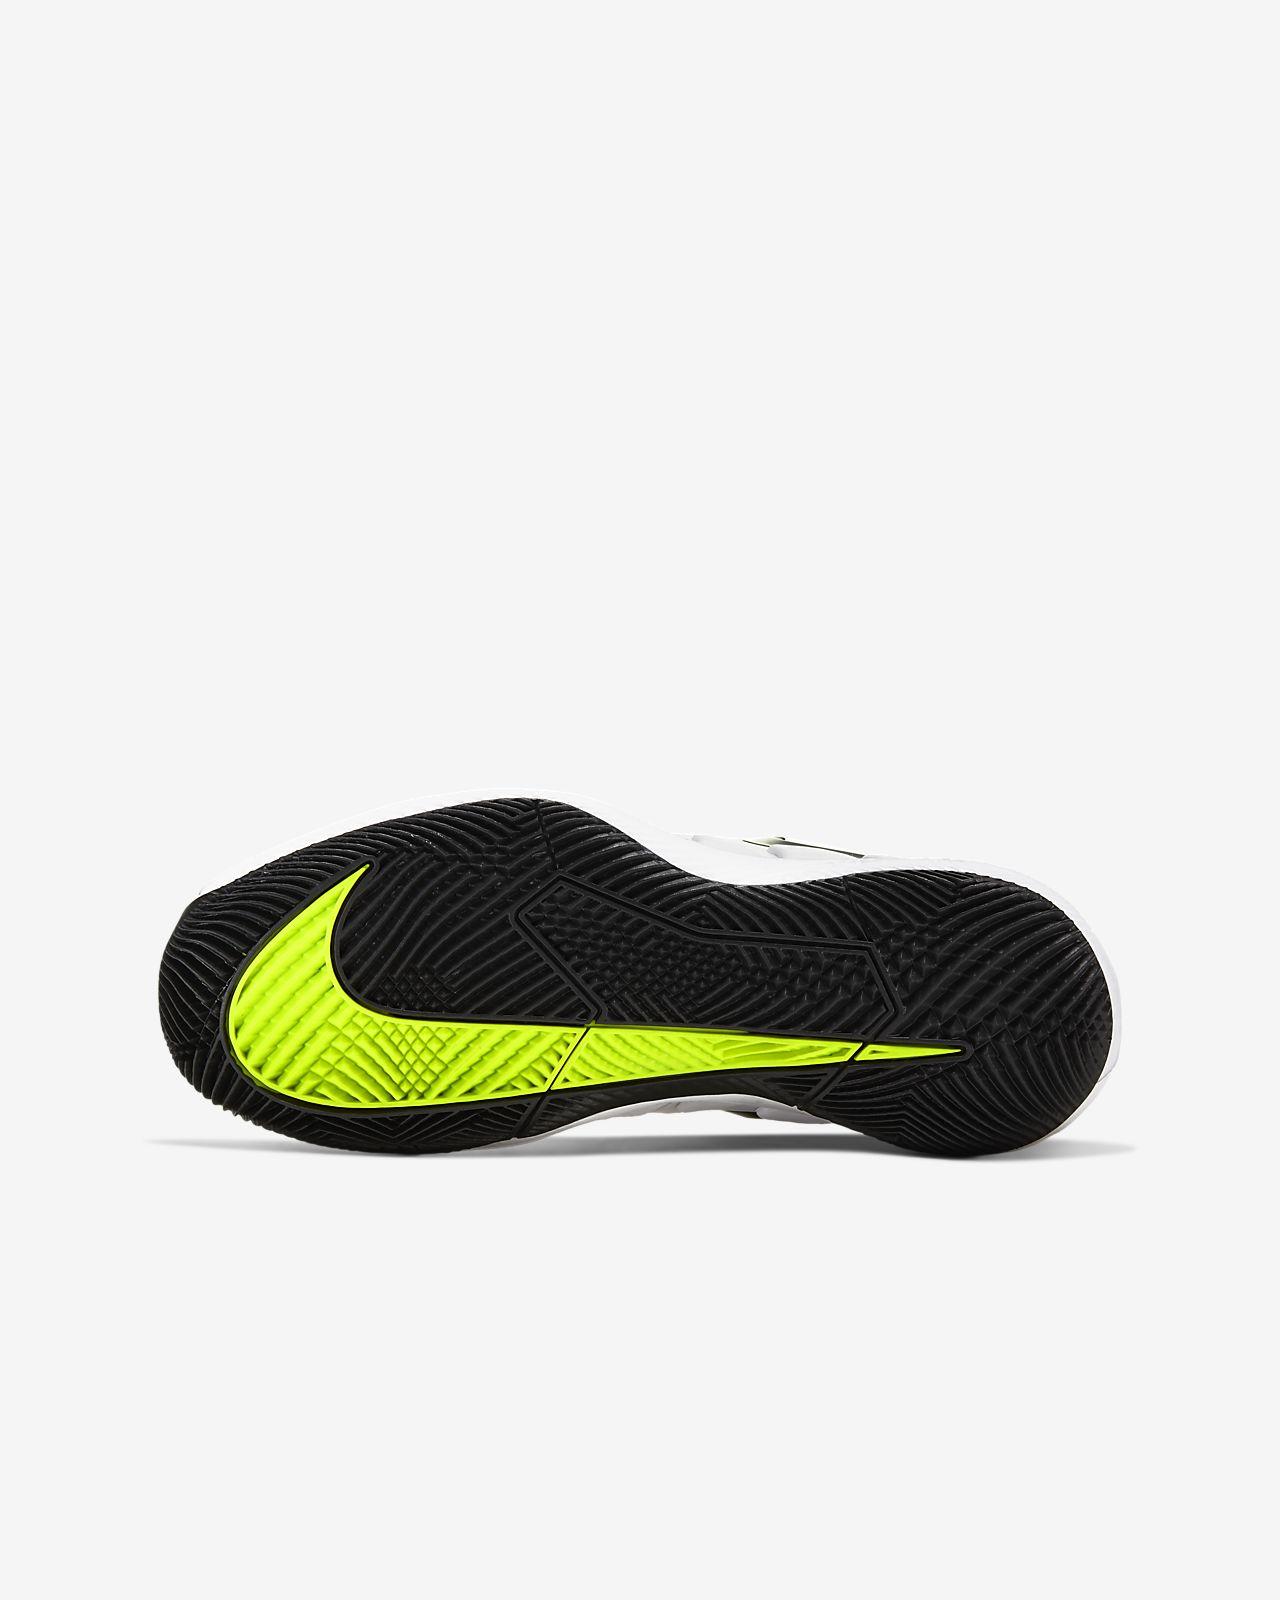 scarpe da tennis nike ragazzo